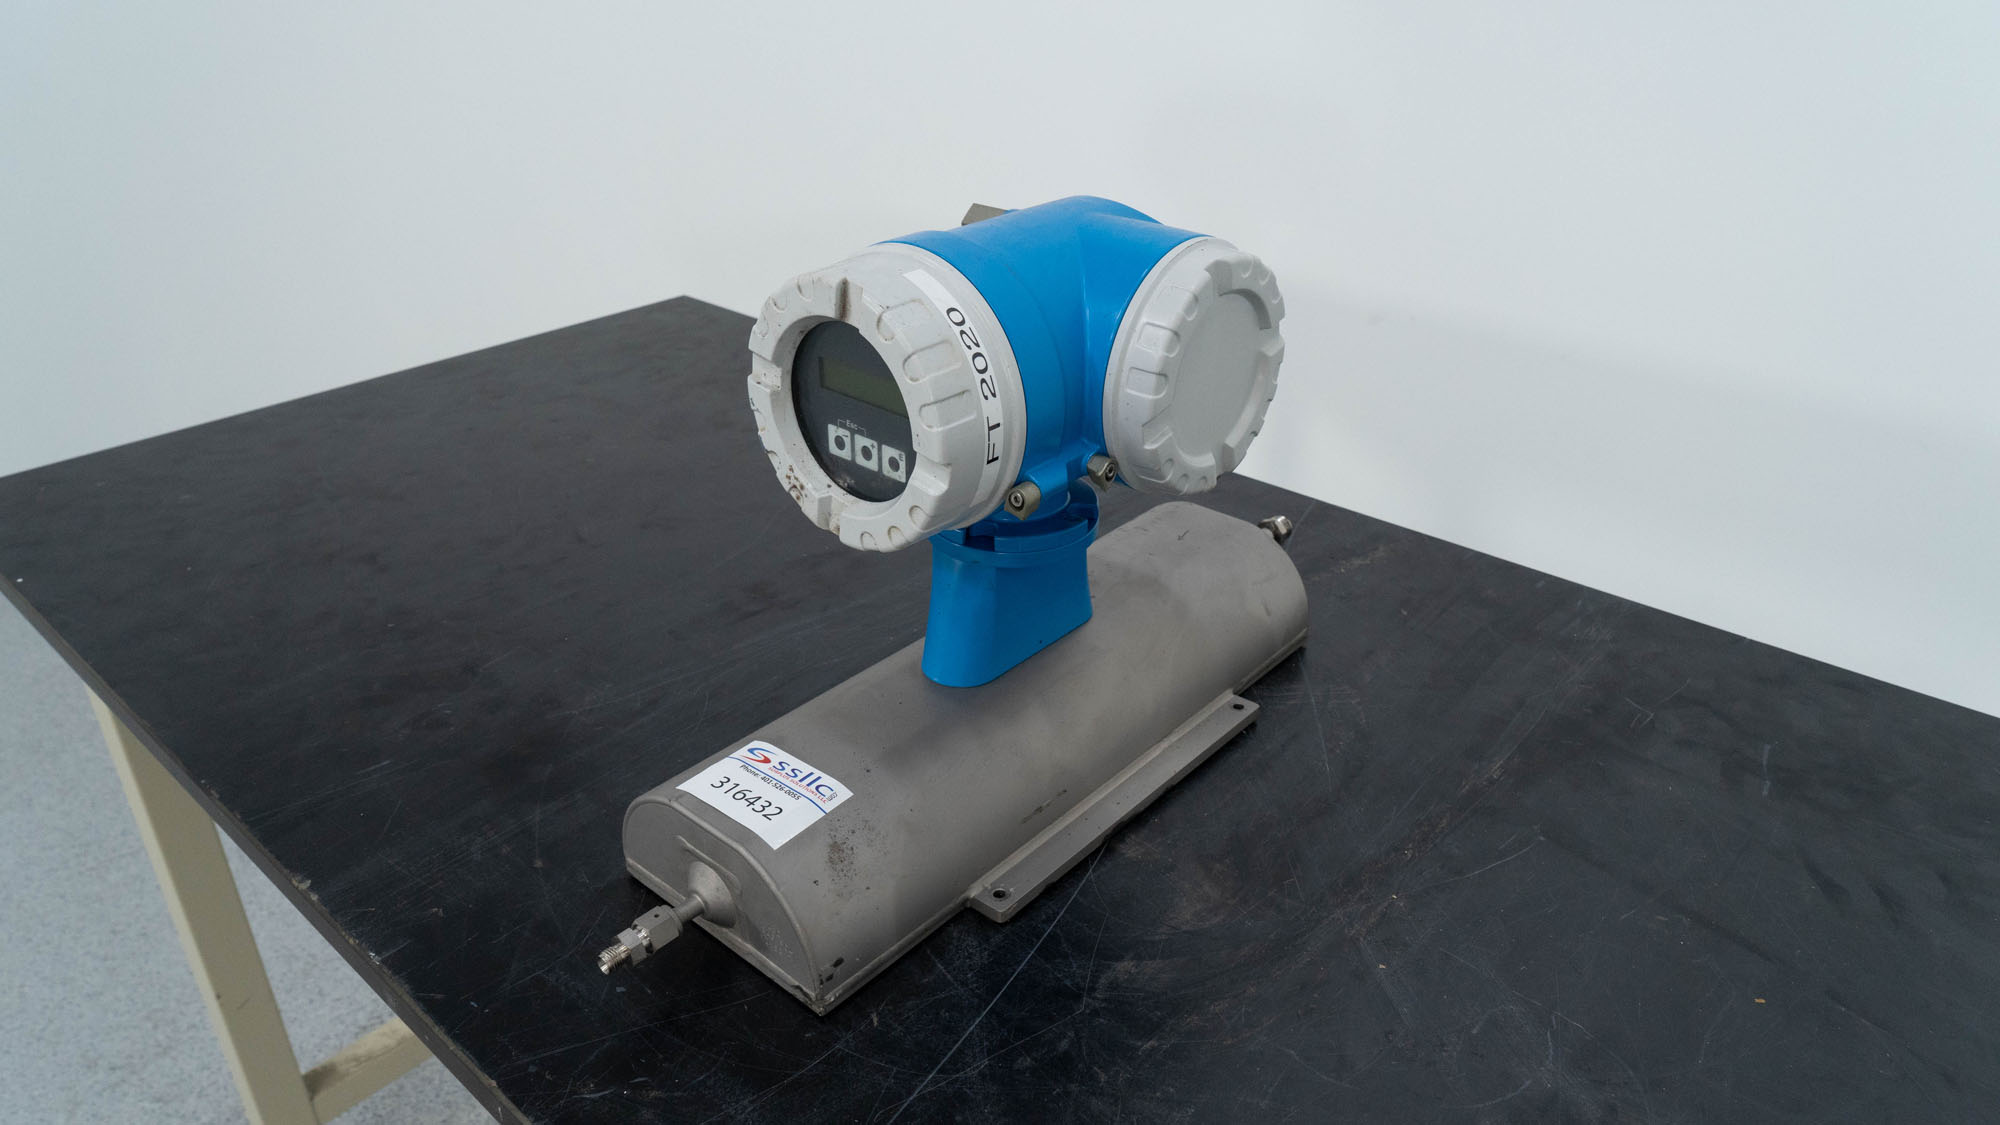 Endress+Hauser Promass 80 Flow Meter